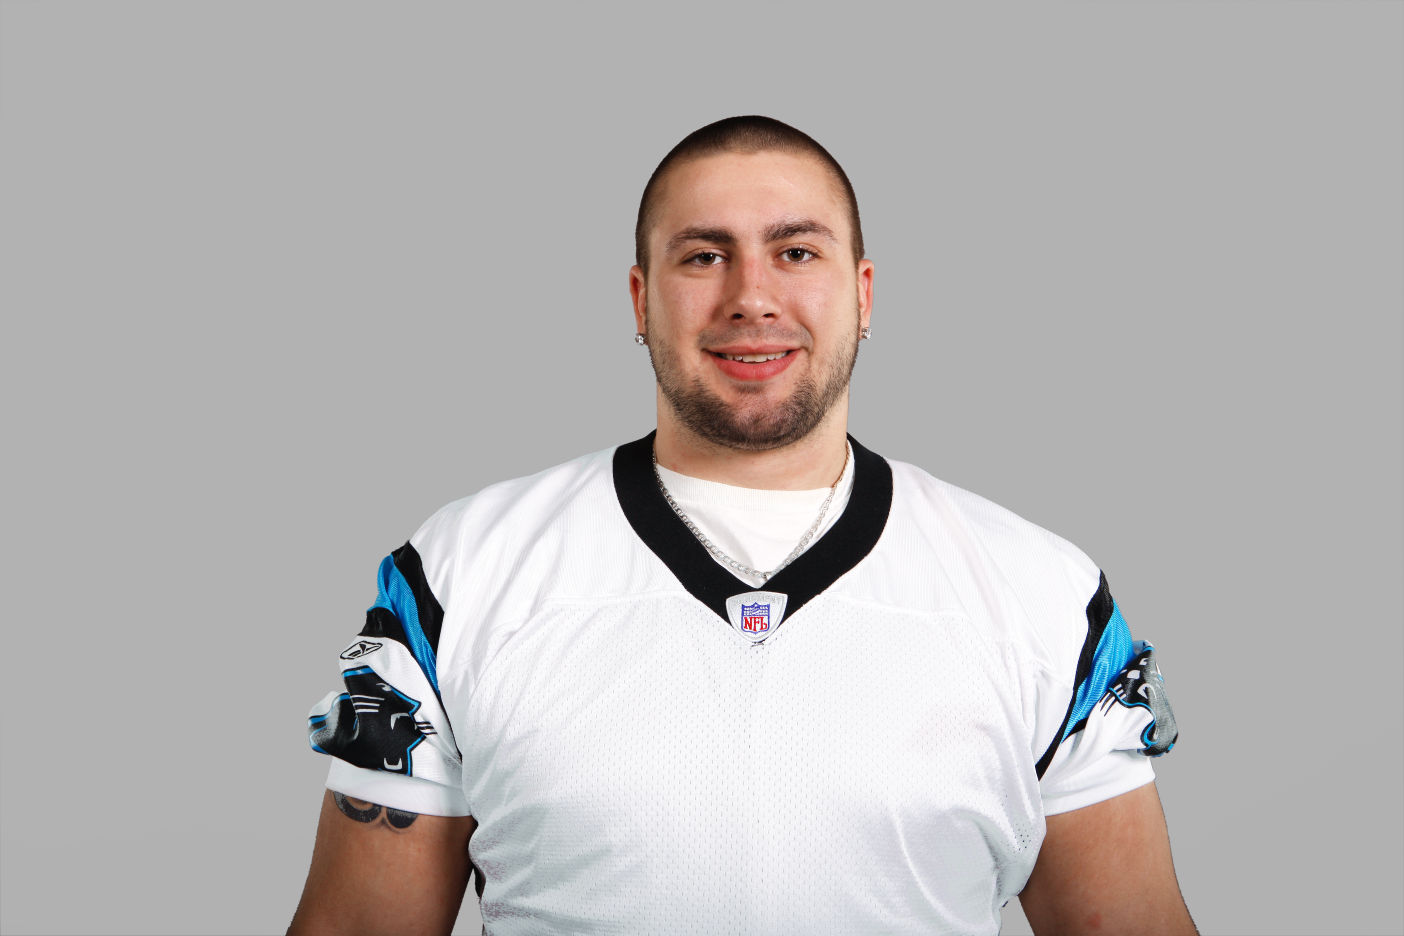 Panthers sign Hayden, Schwartz to practice squad   Latest News ...